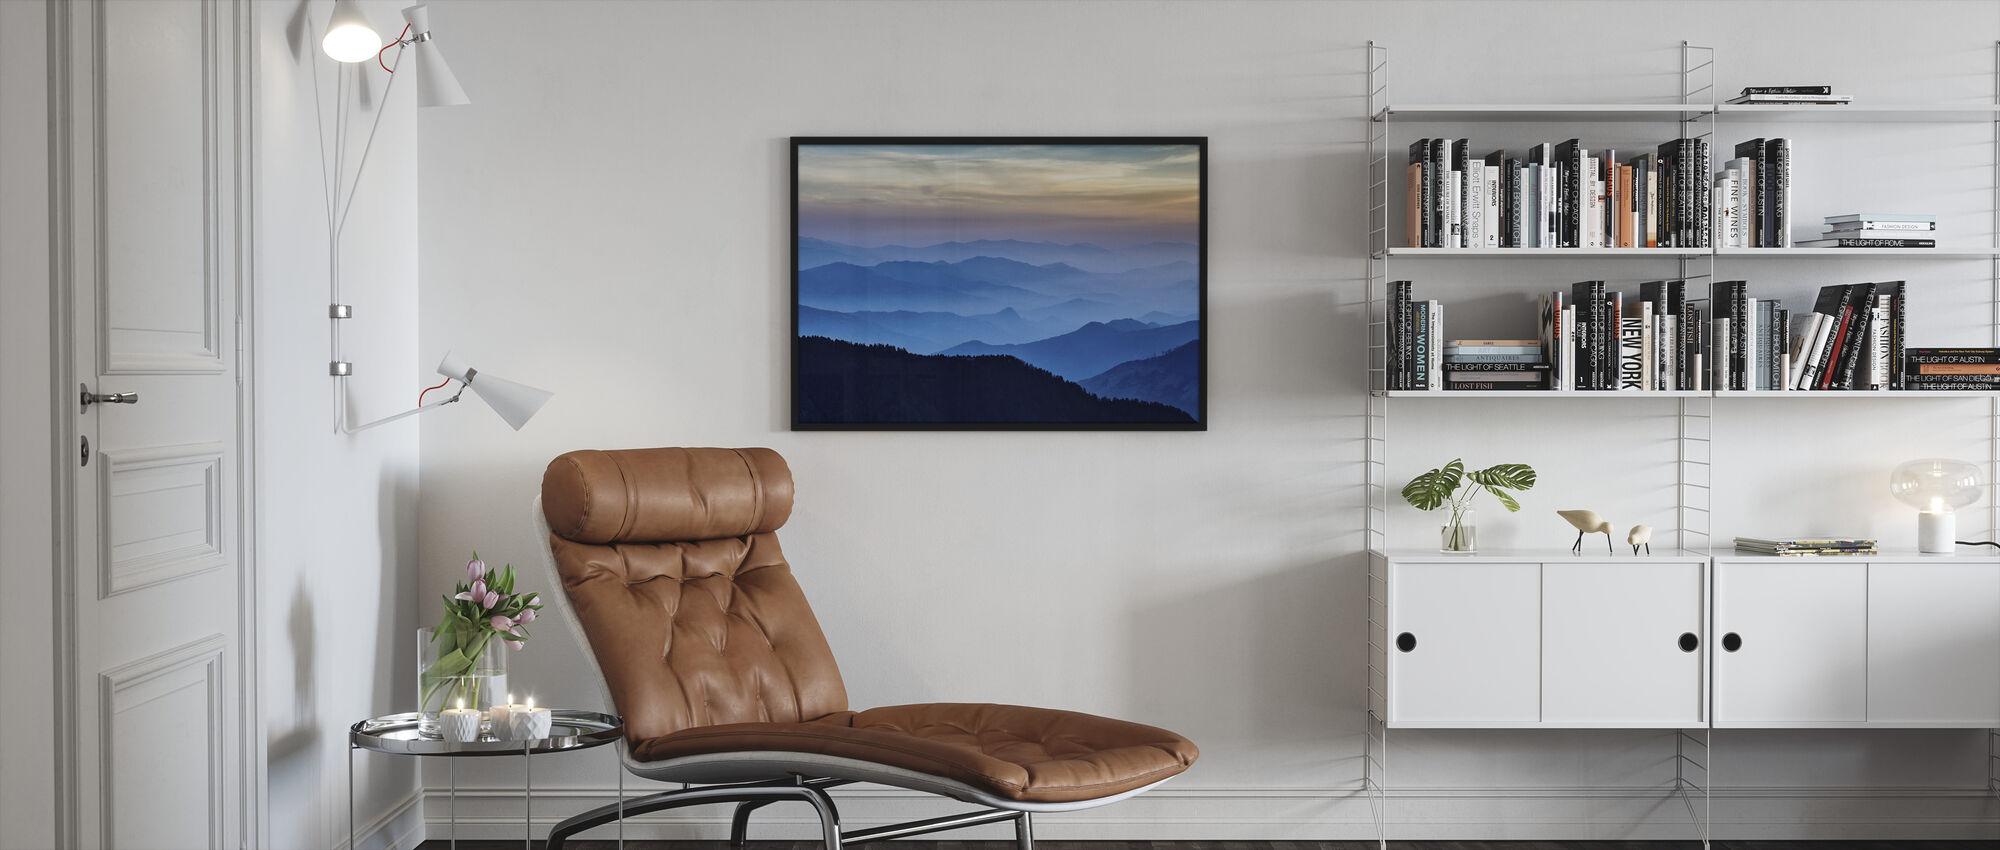 Rhythm of the Mountains - Framed print - Living Room